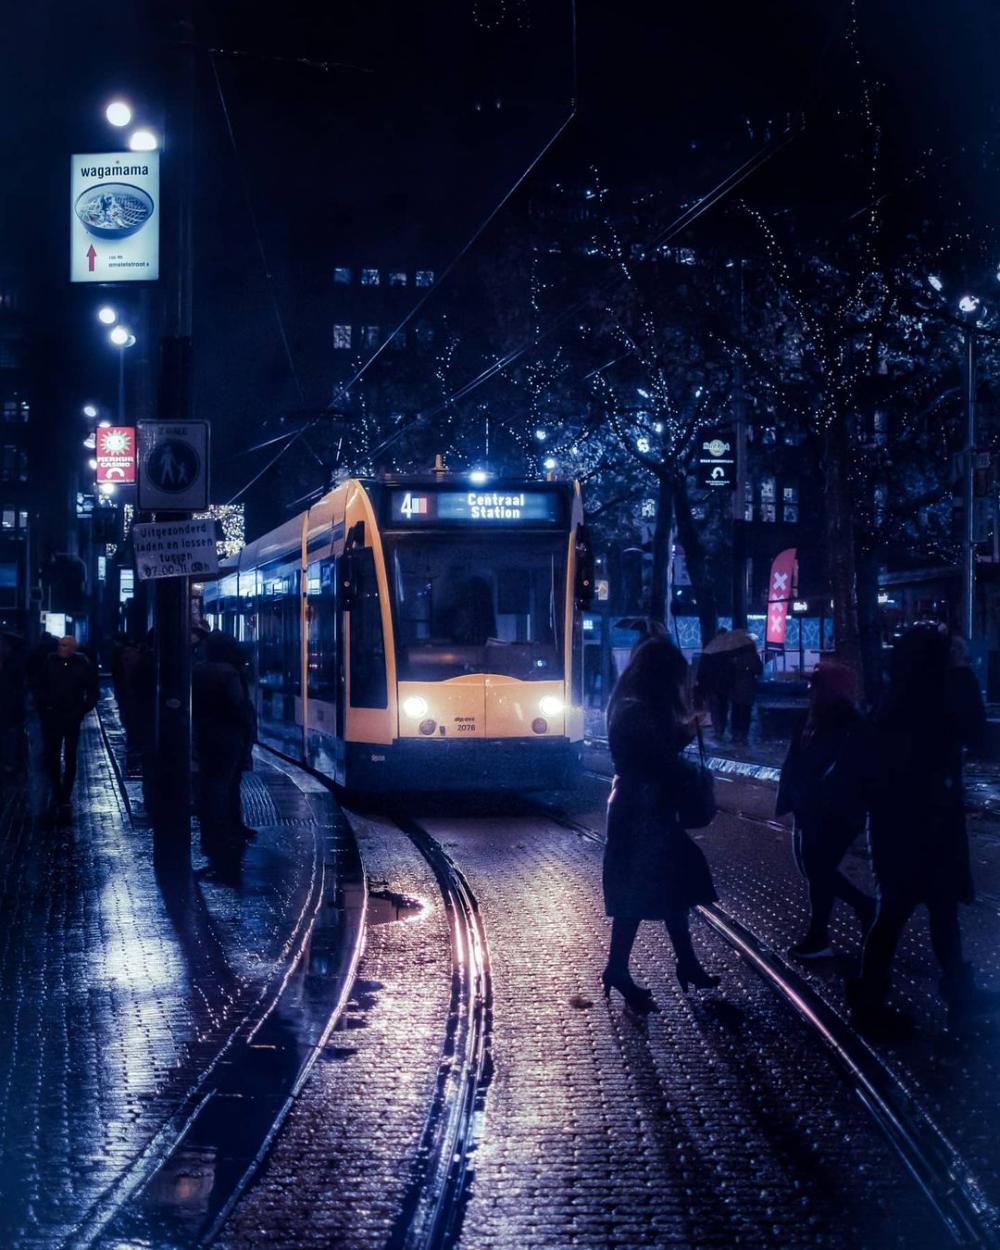 #Amsterdam #instamoment #instagood #instamood #ipopgr #iamsterdam #instalifo #ig_captures #reflectio - @anellaki - Picterio